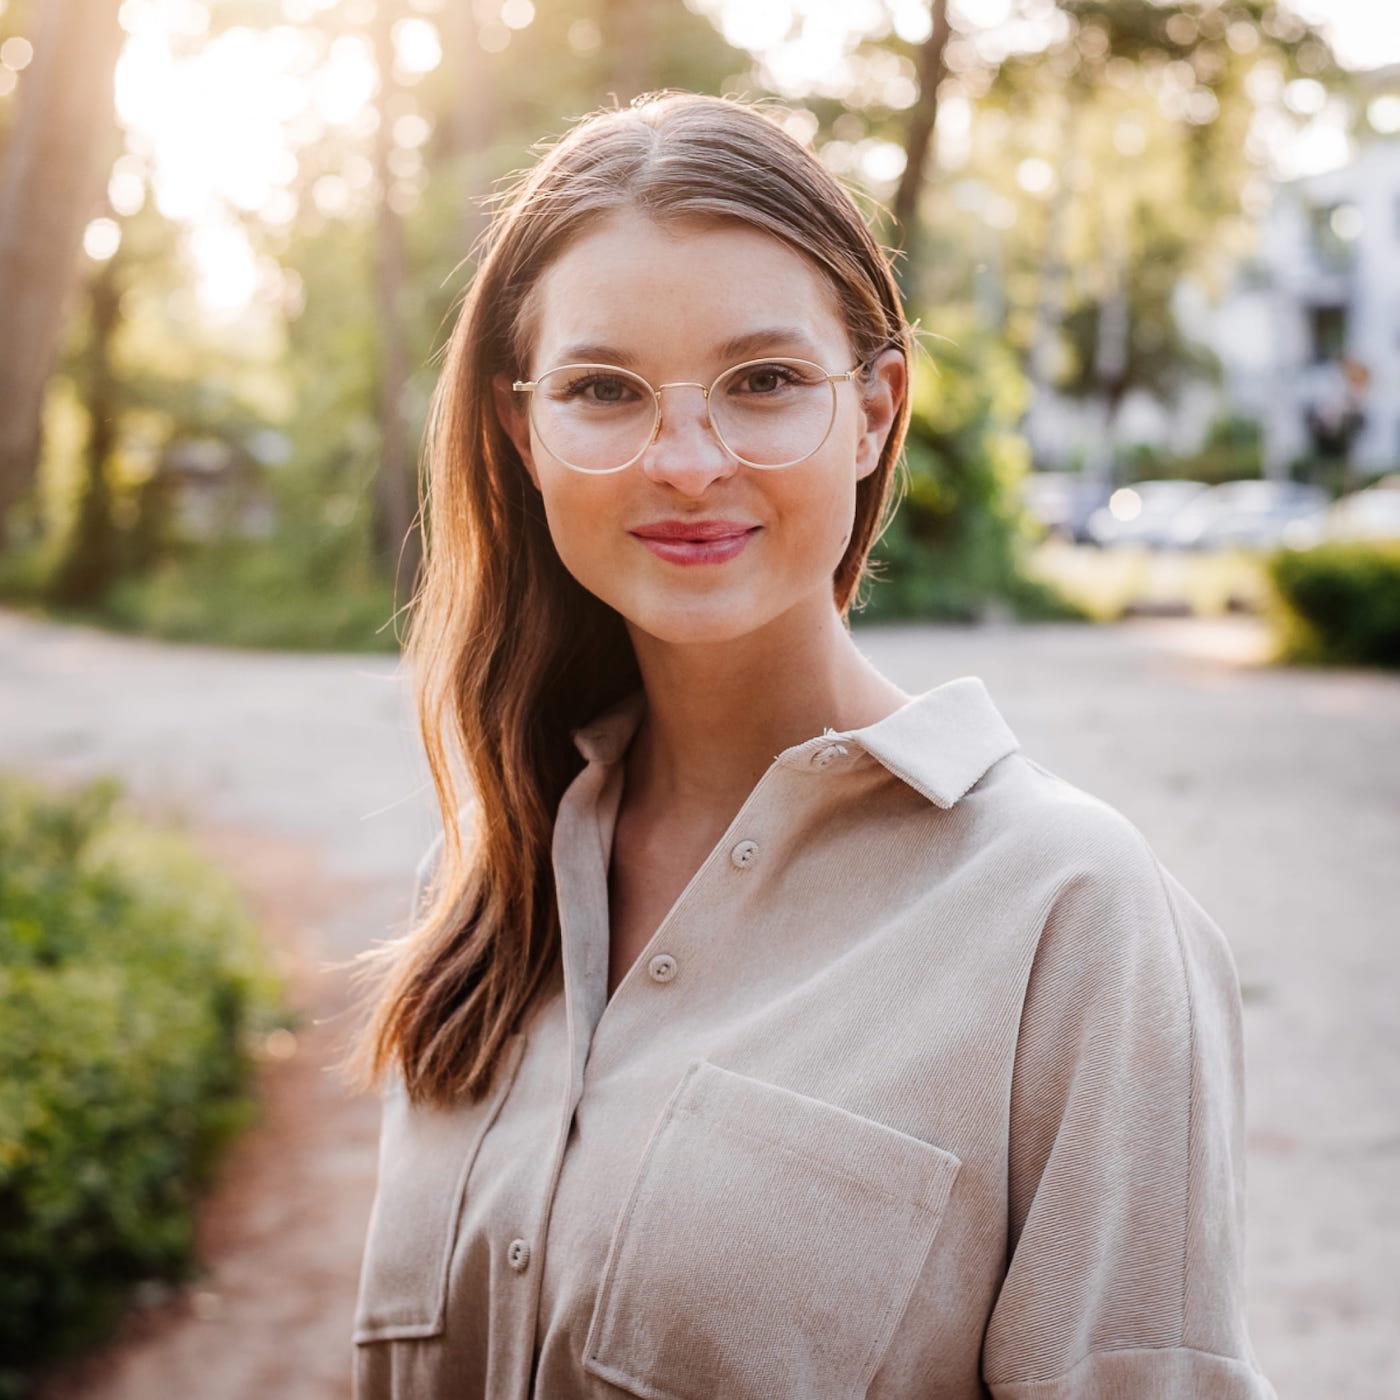 Sandra Wulff Bewertung über Kenjo